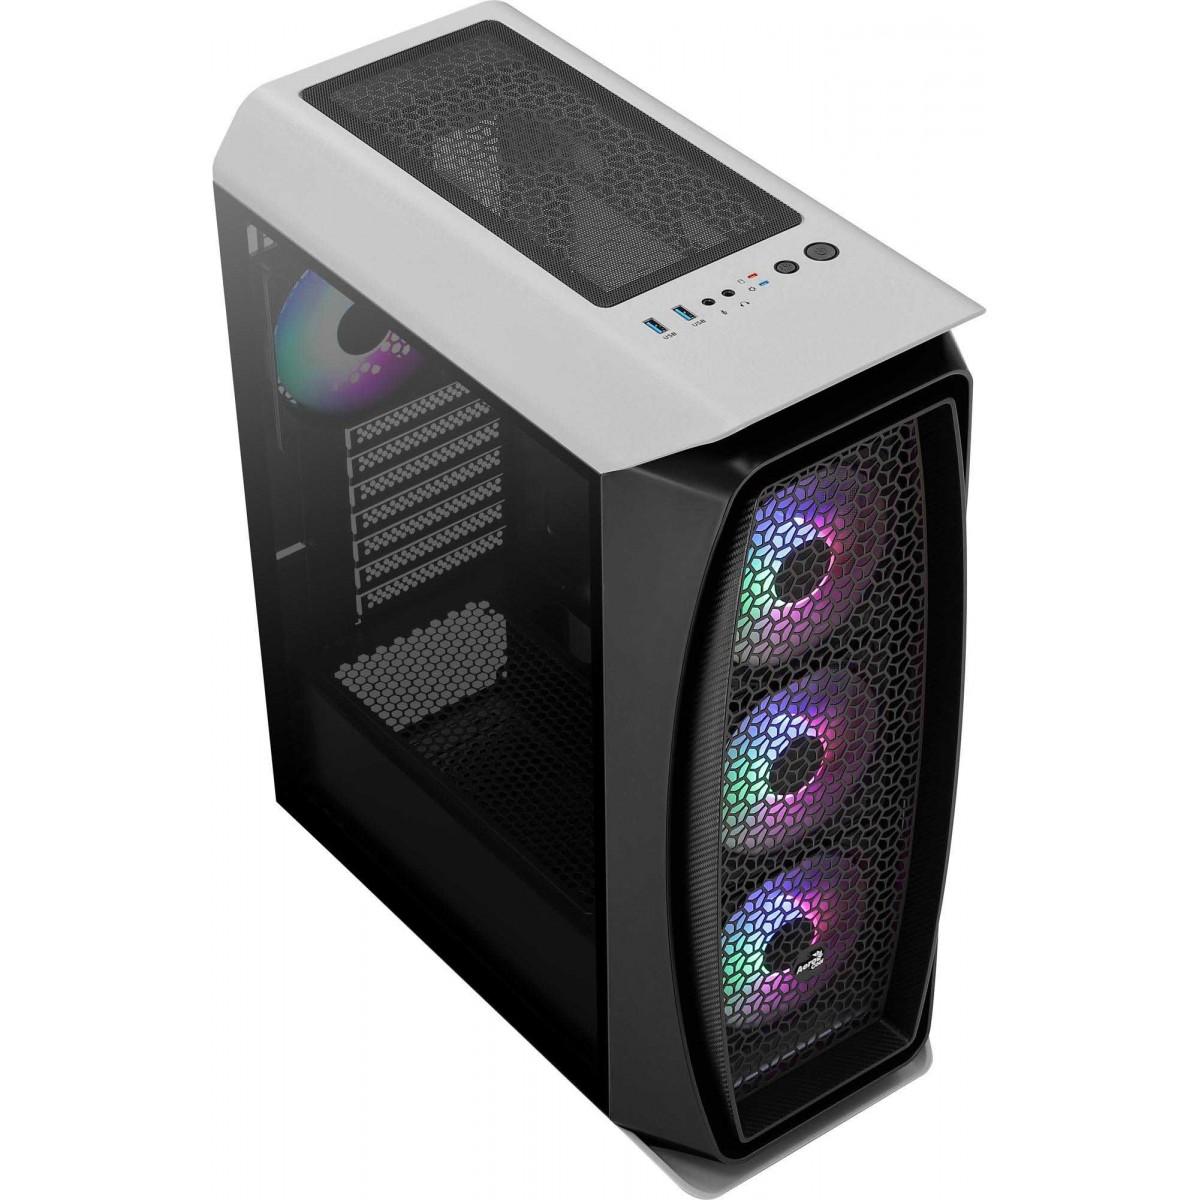 Gabinete Gamer Aerocool, Aero One Frost RGB, Mid Tower, Vidro Temperado, White, 70168, Sem Fonte, Com 4 Fans